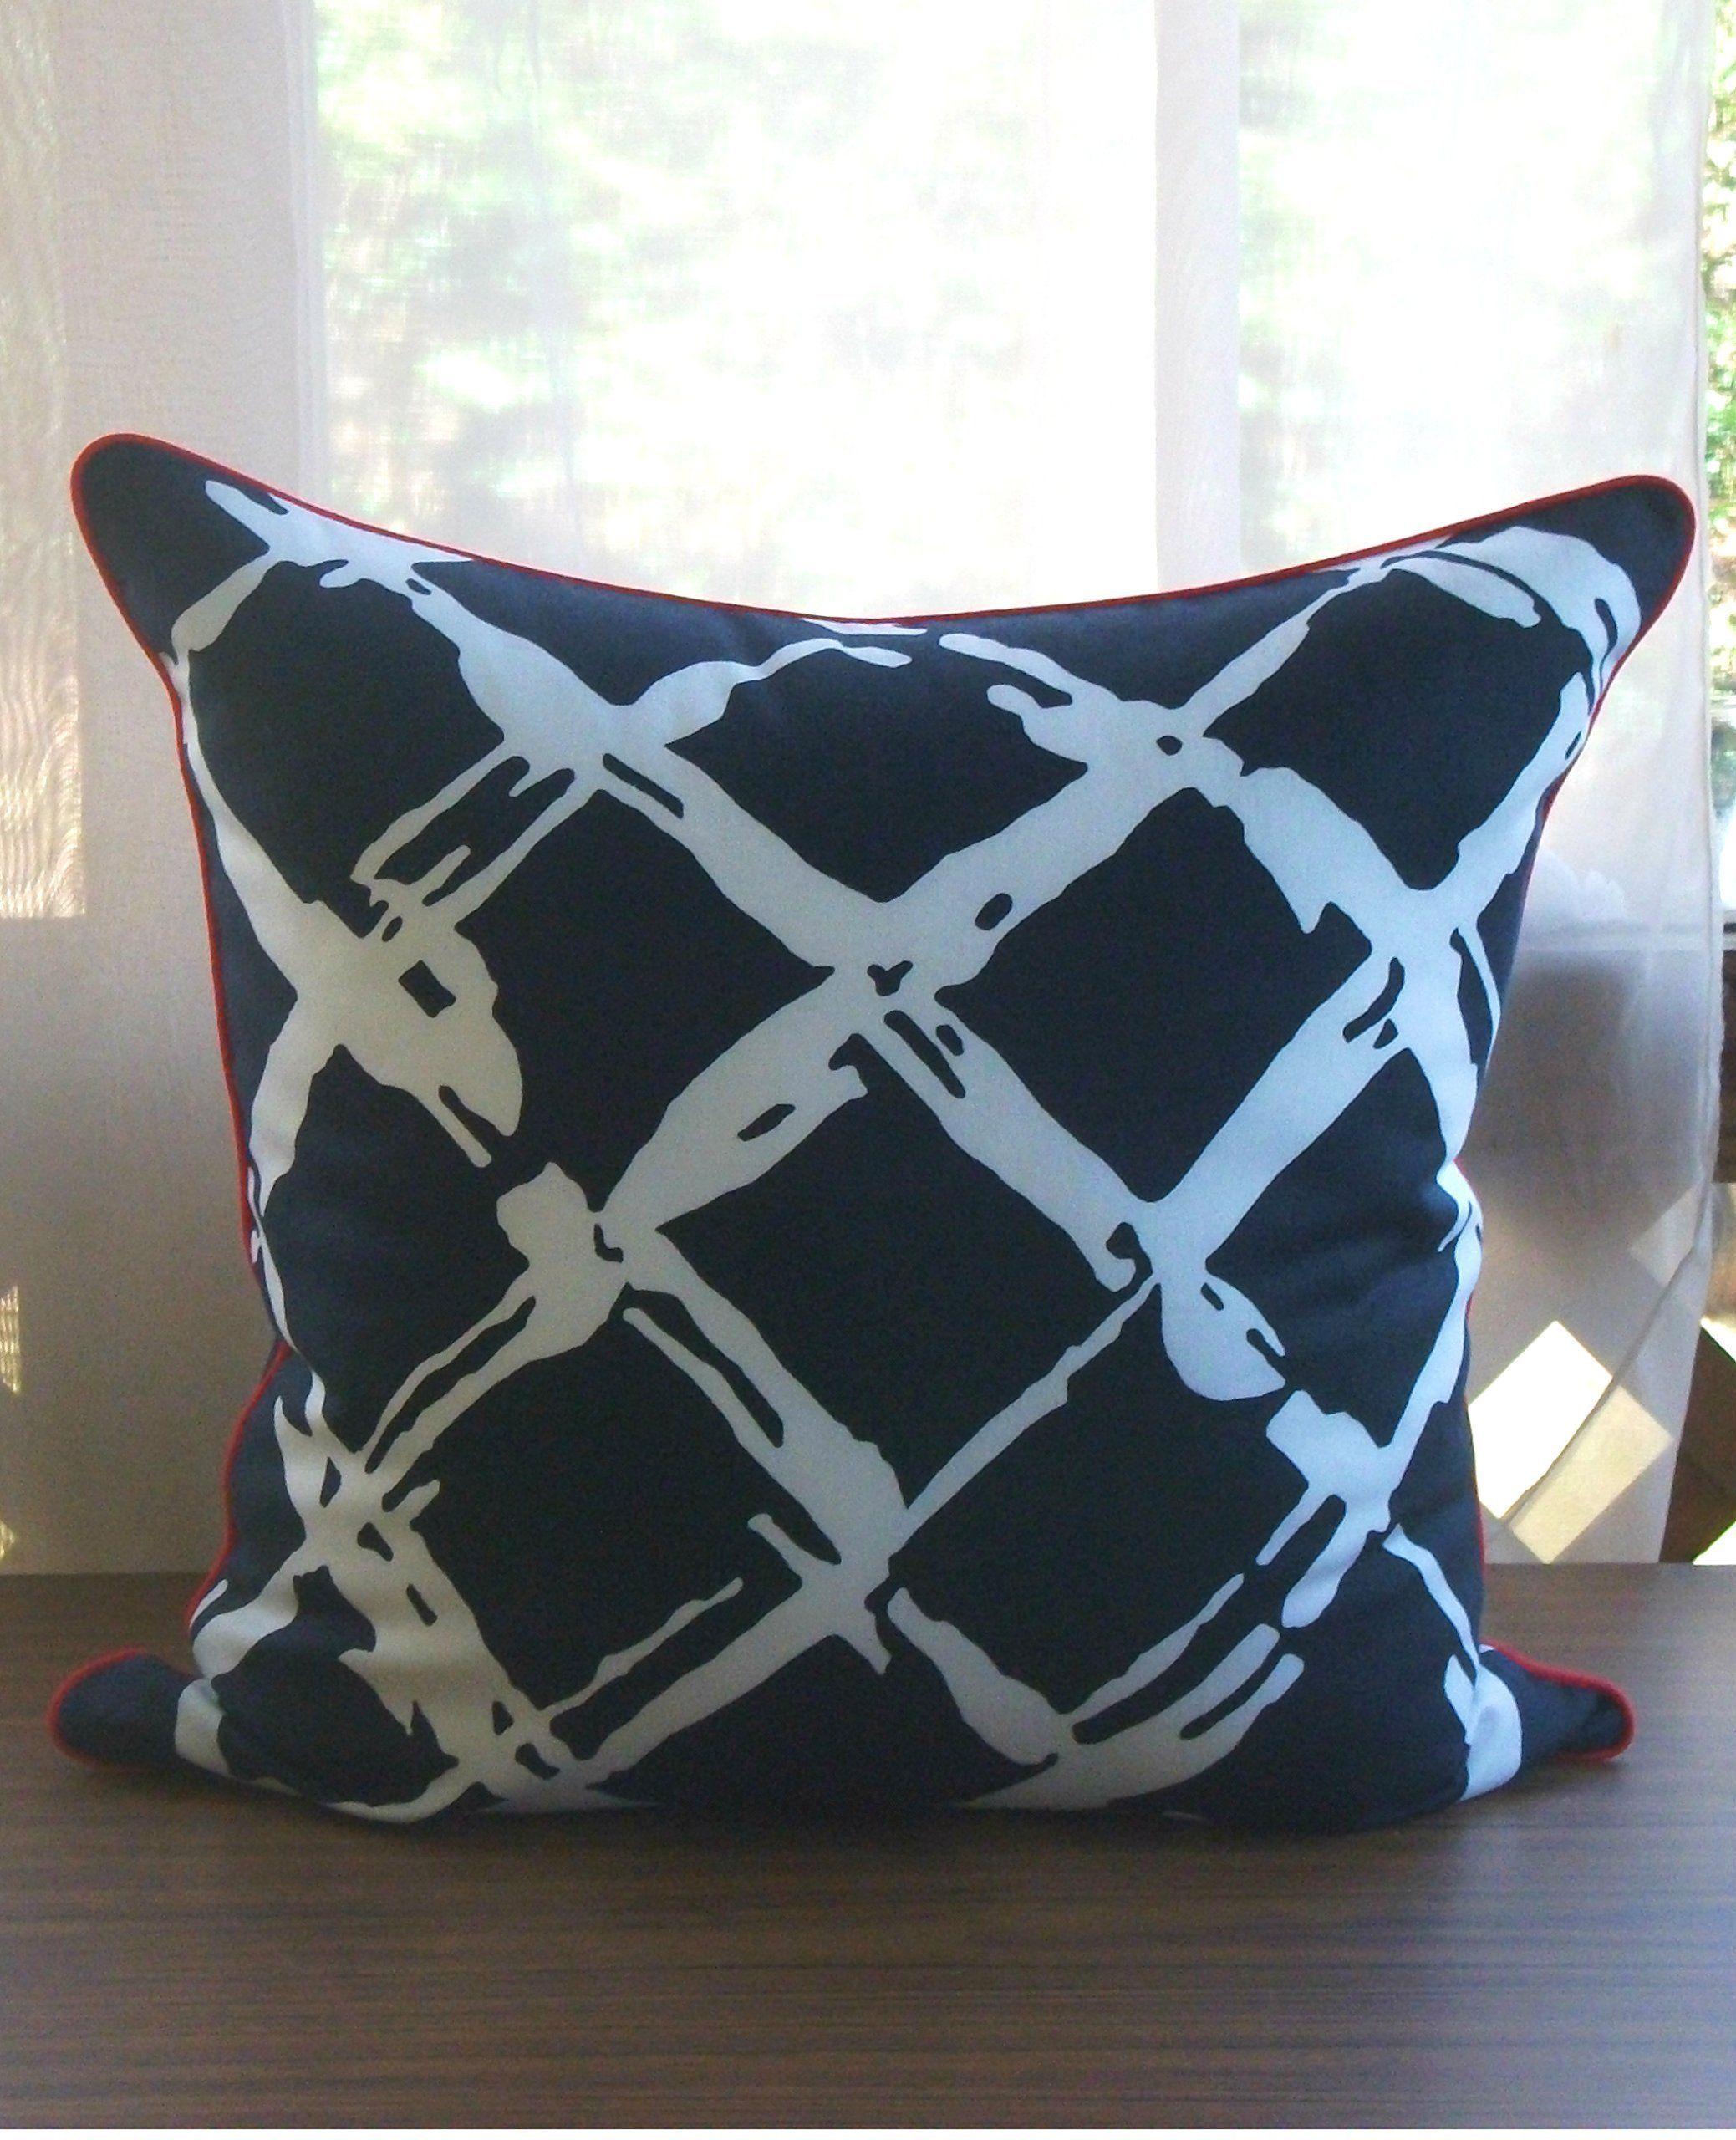 Handmade robert allen navy throw pillow cover large tidal wave